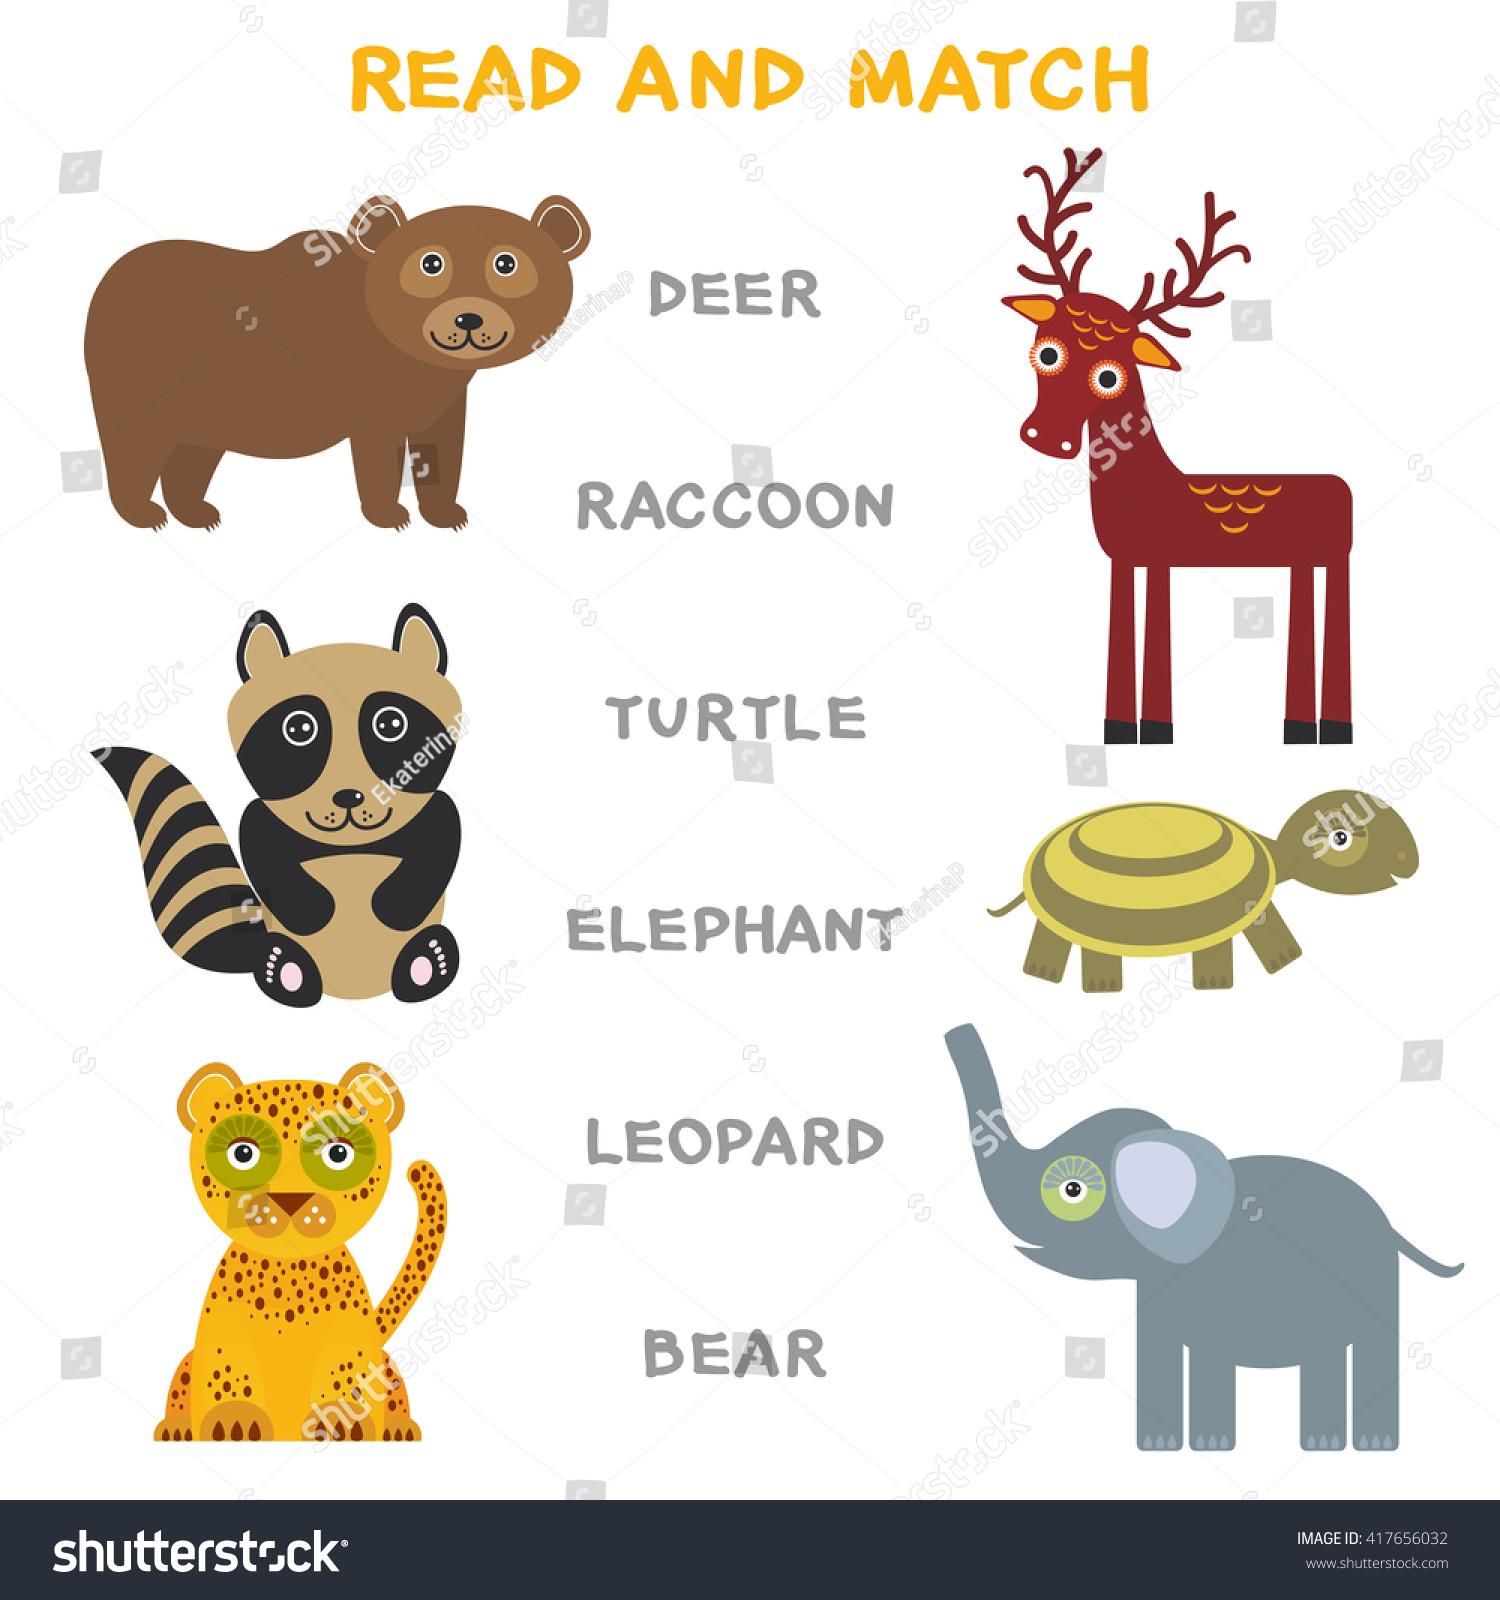 Kids Words Learning Game Worksheet Read Stock Vector